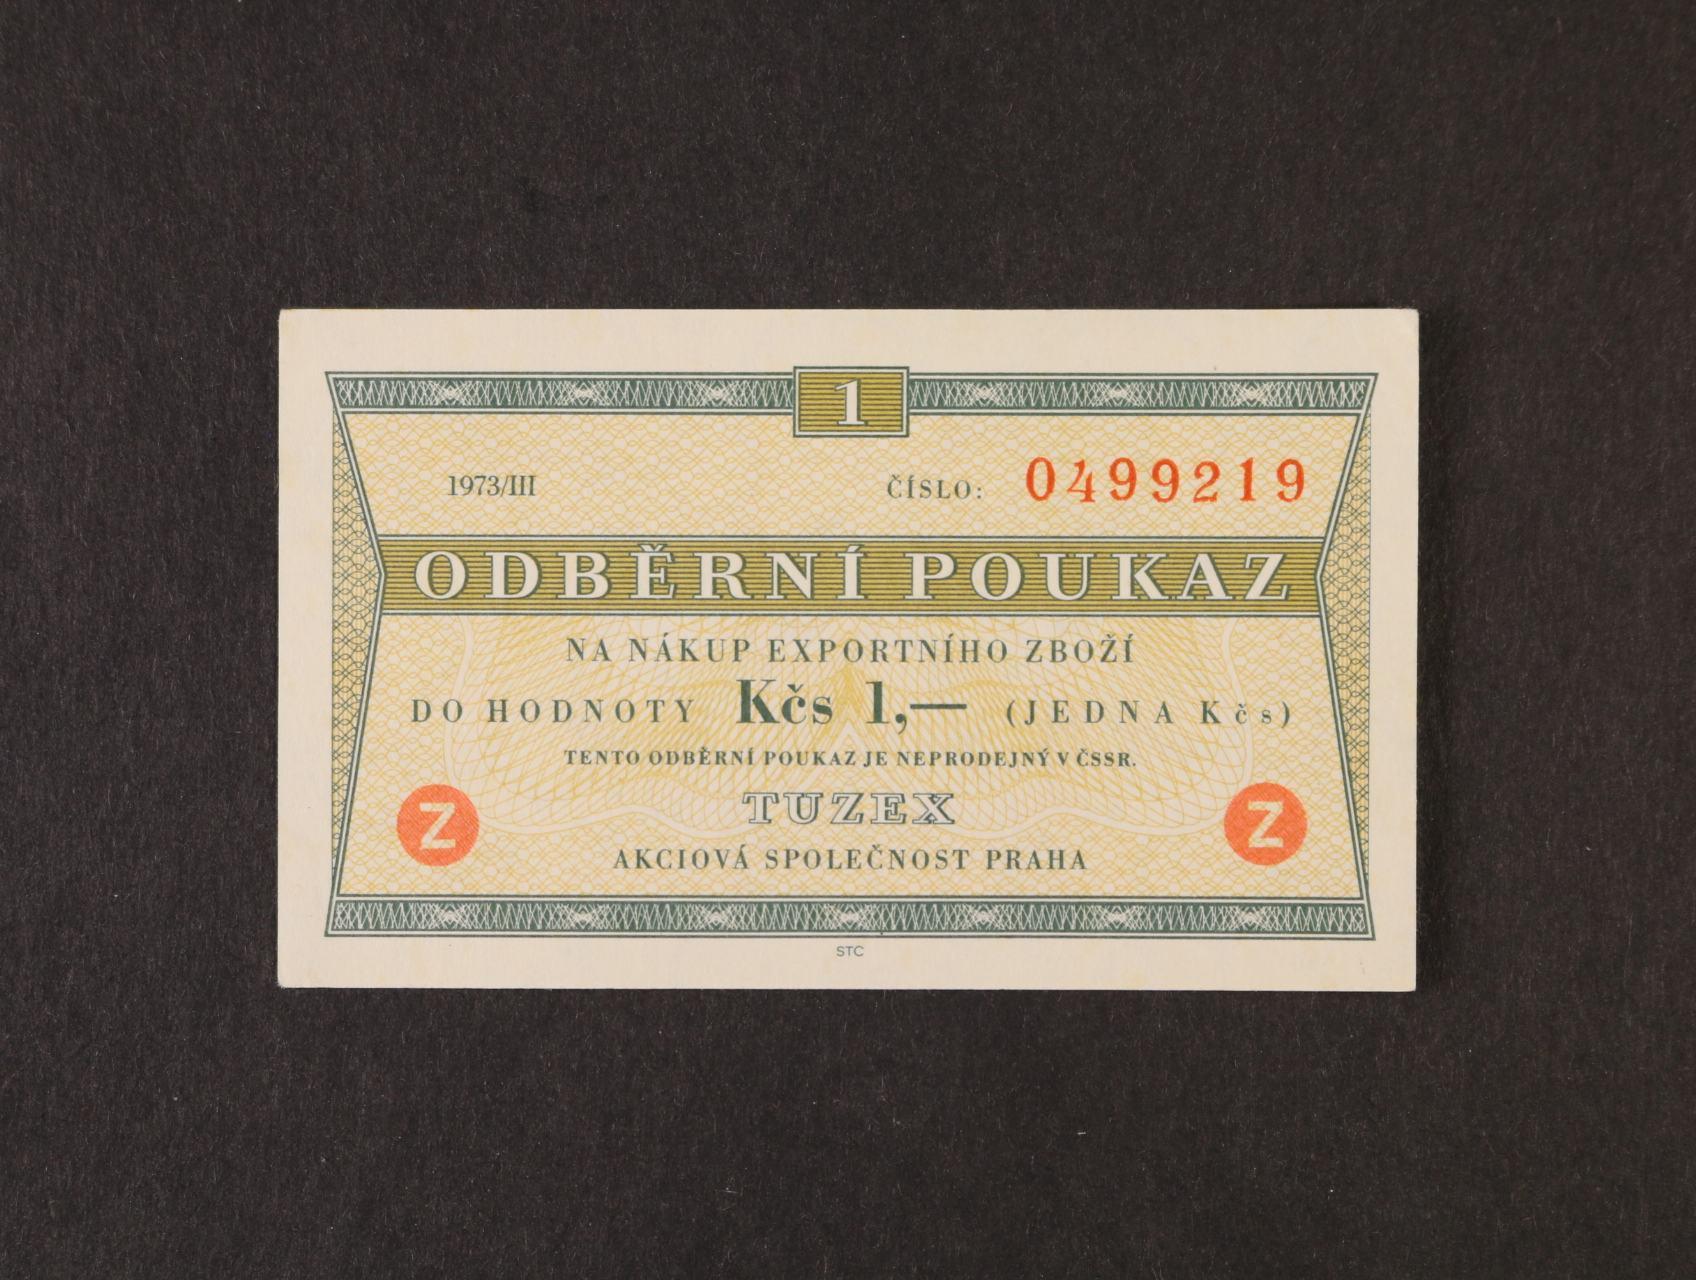 Tuzex, 1 TKčs s datem 1973/III